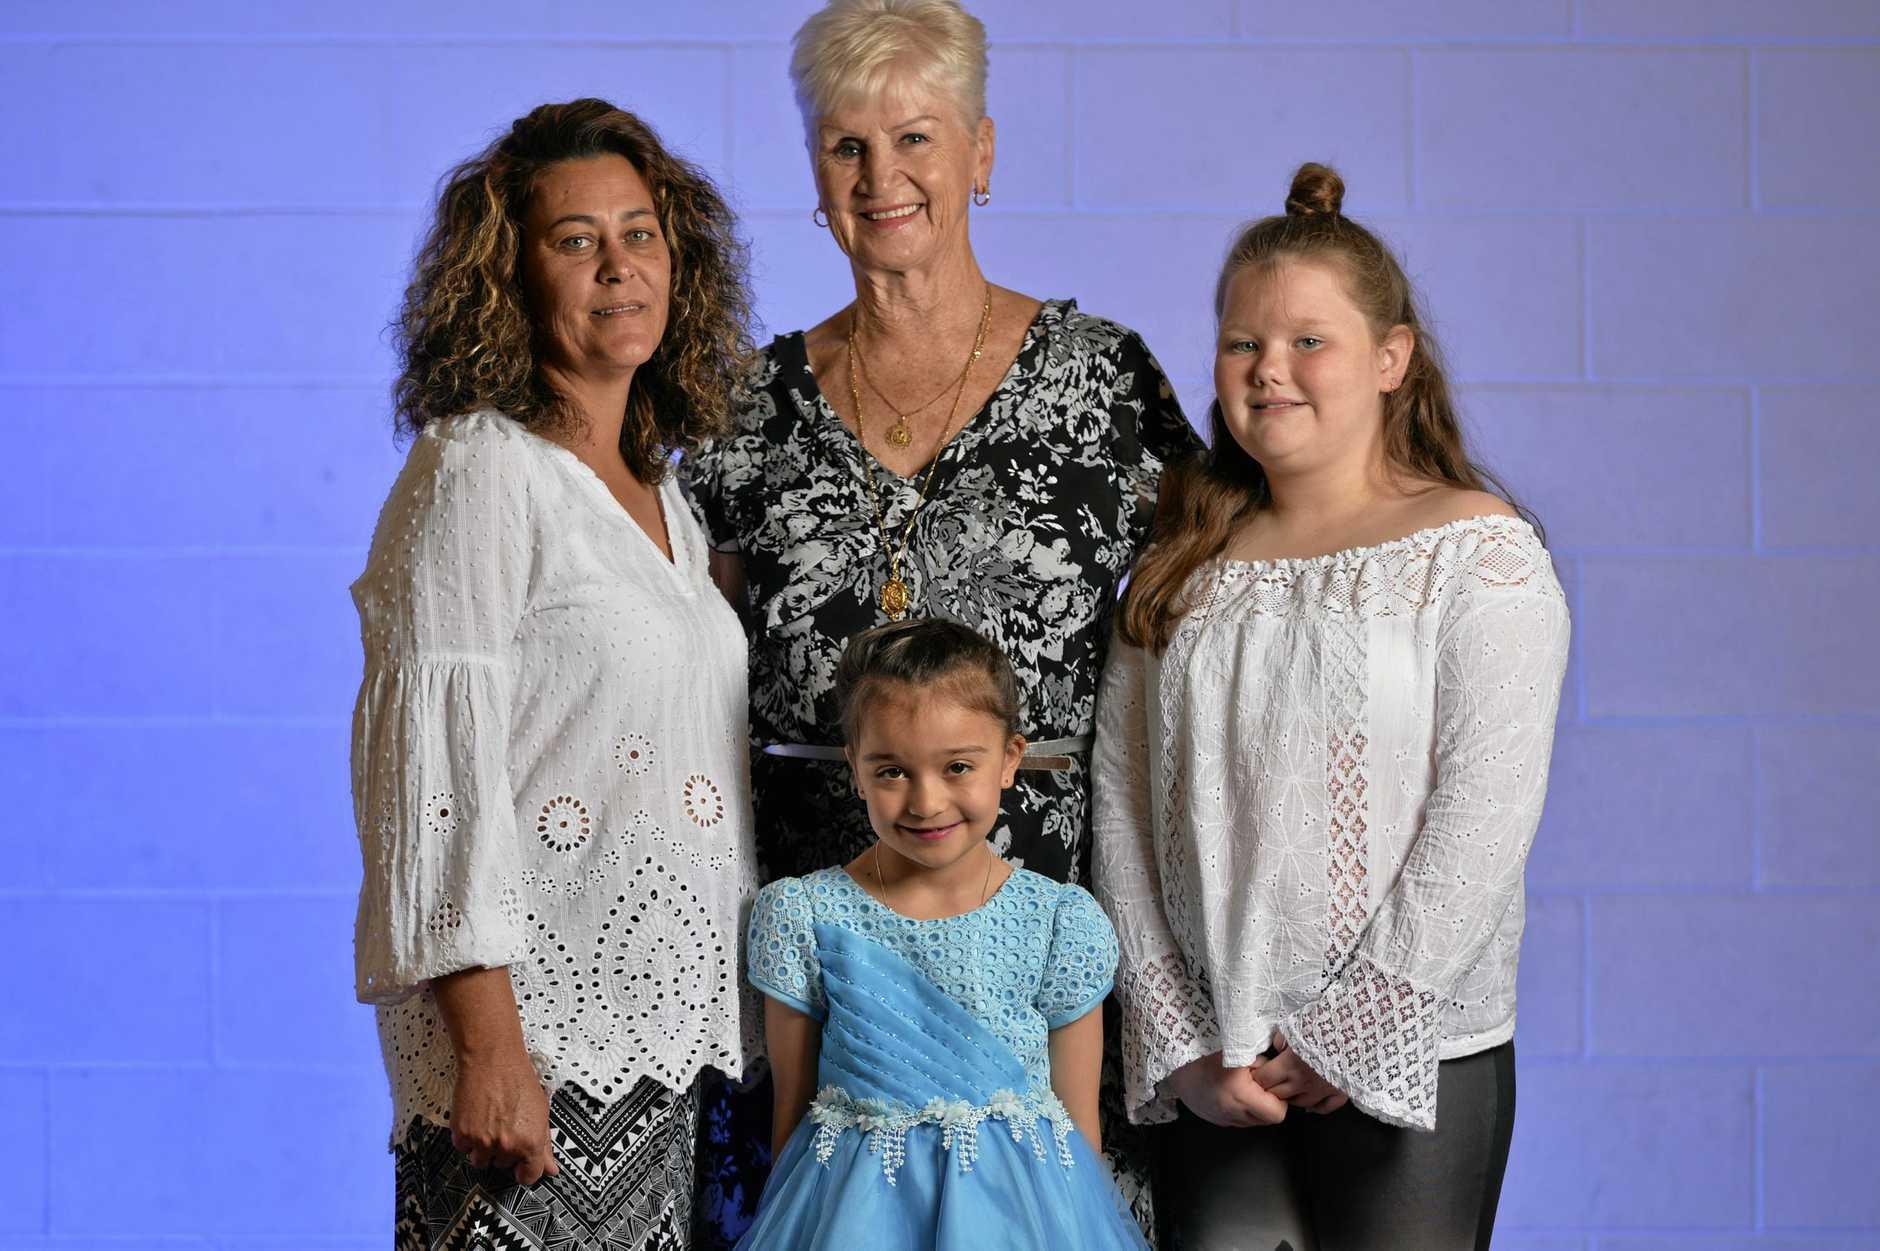 Lily Stapleton, 7, Emily Ficheroux, 11, Lee Smith (light hair) , and Jacqui stringer (dark hair) ahead of Salvos fashion show.